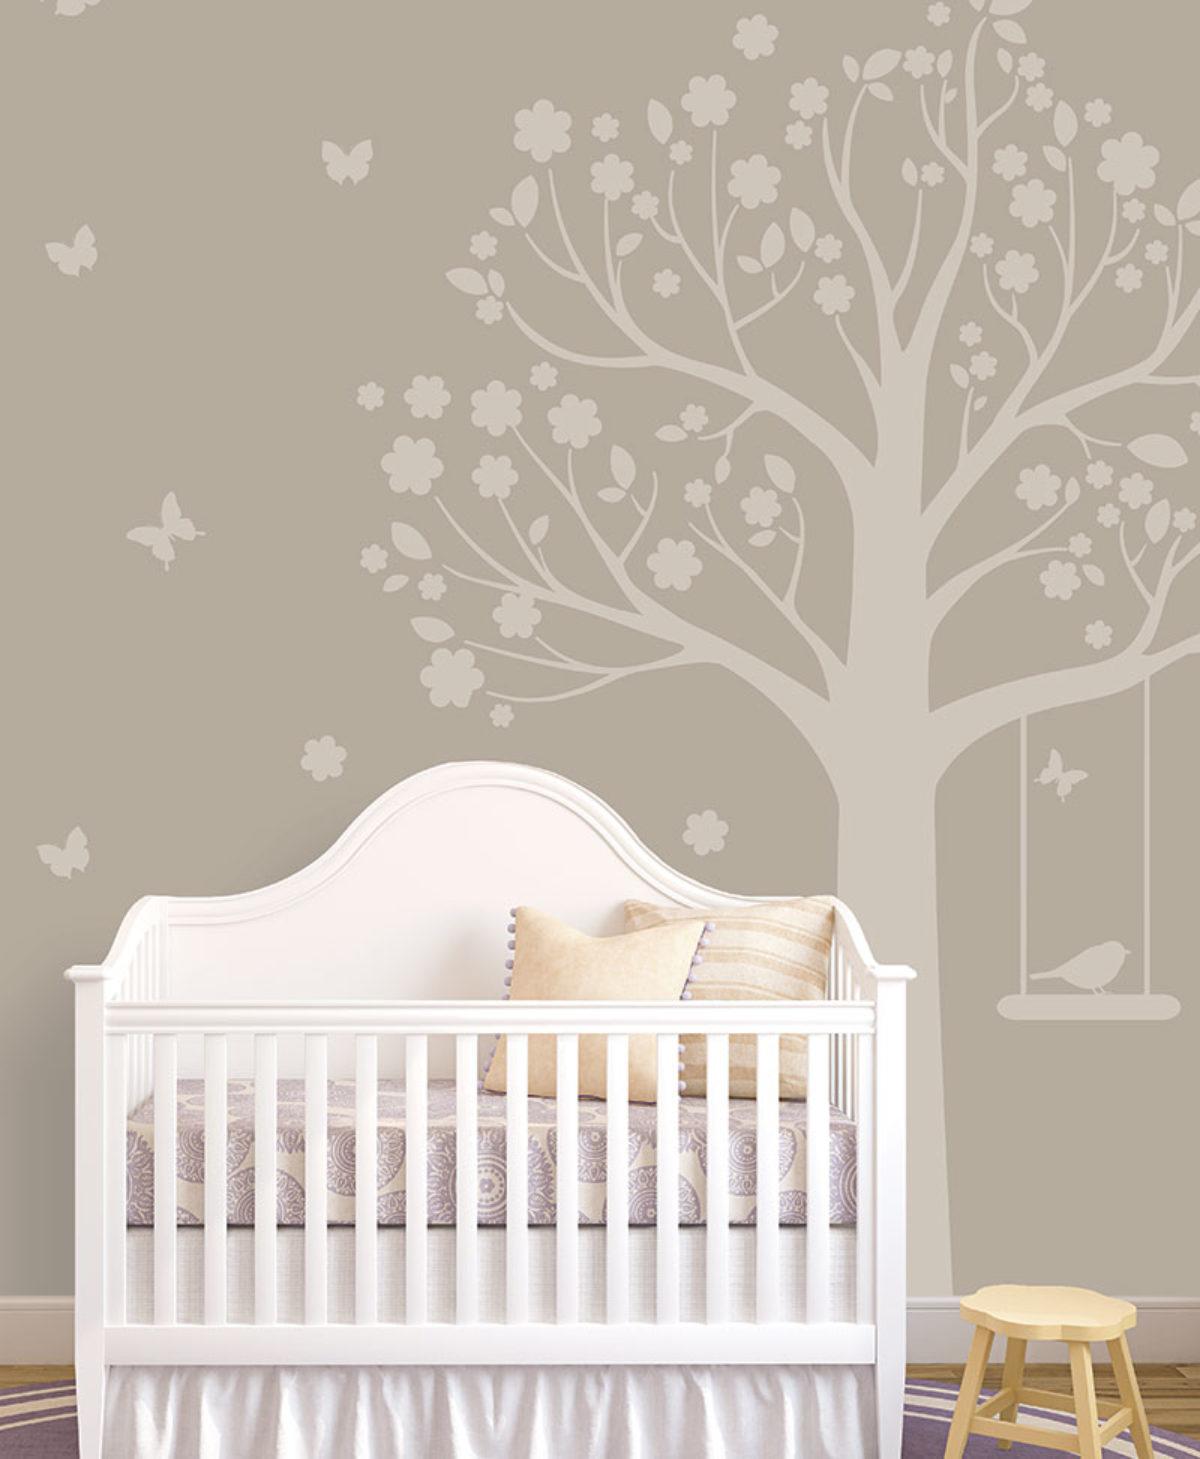 Compra carta da parati tortora per camerette. L Albero Di Moritz Tortora Baby Interior Design Wallpaper